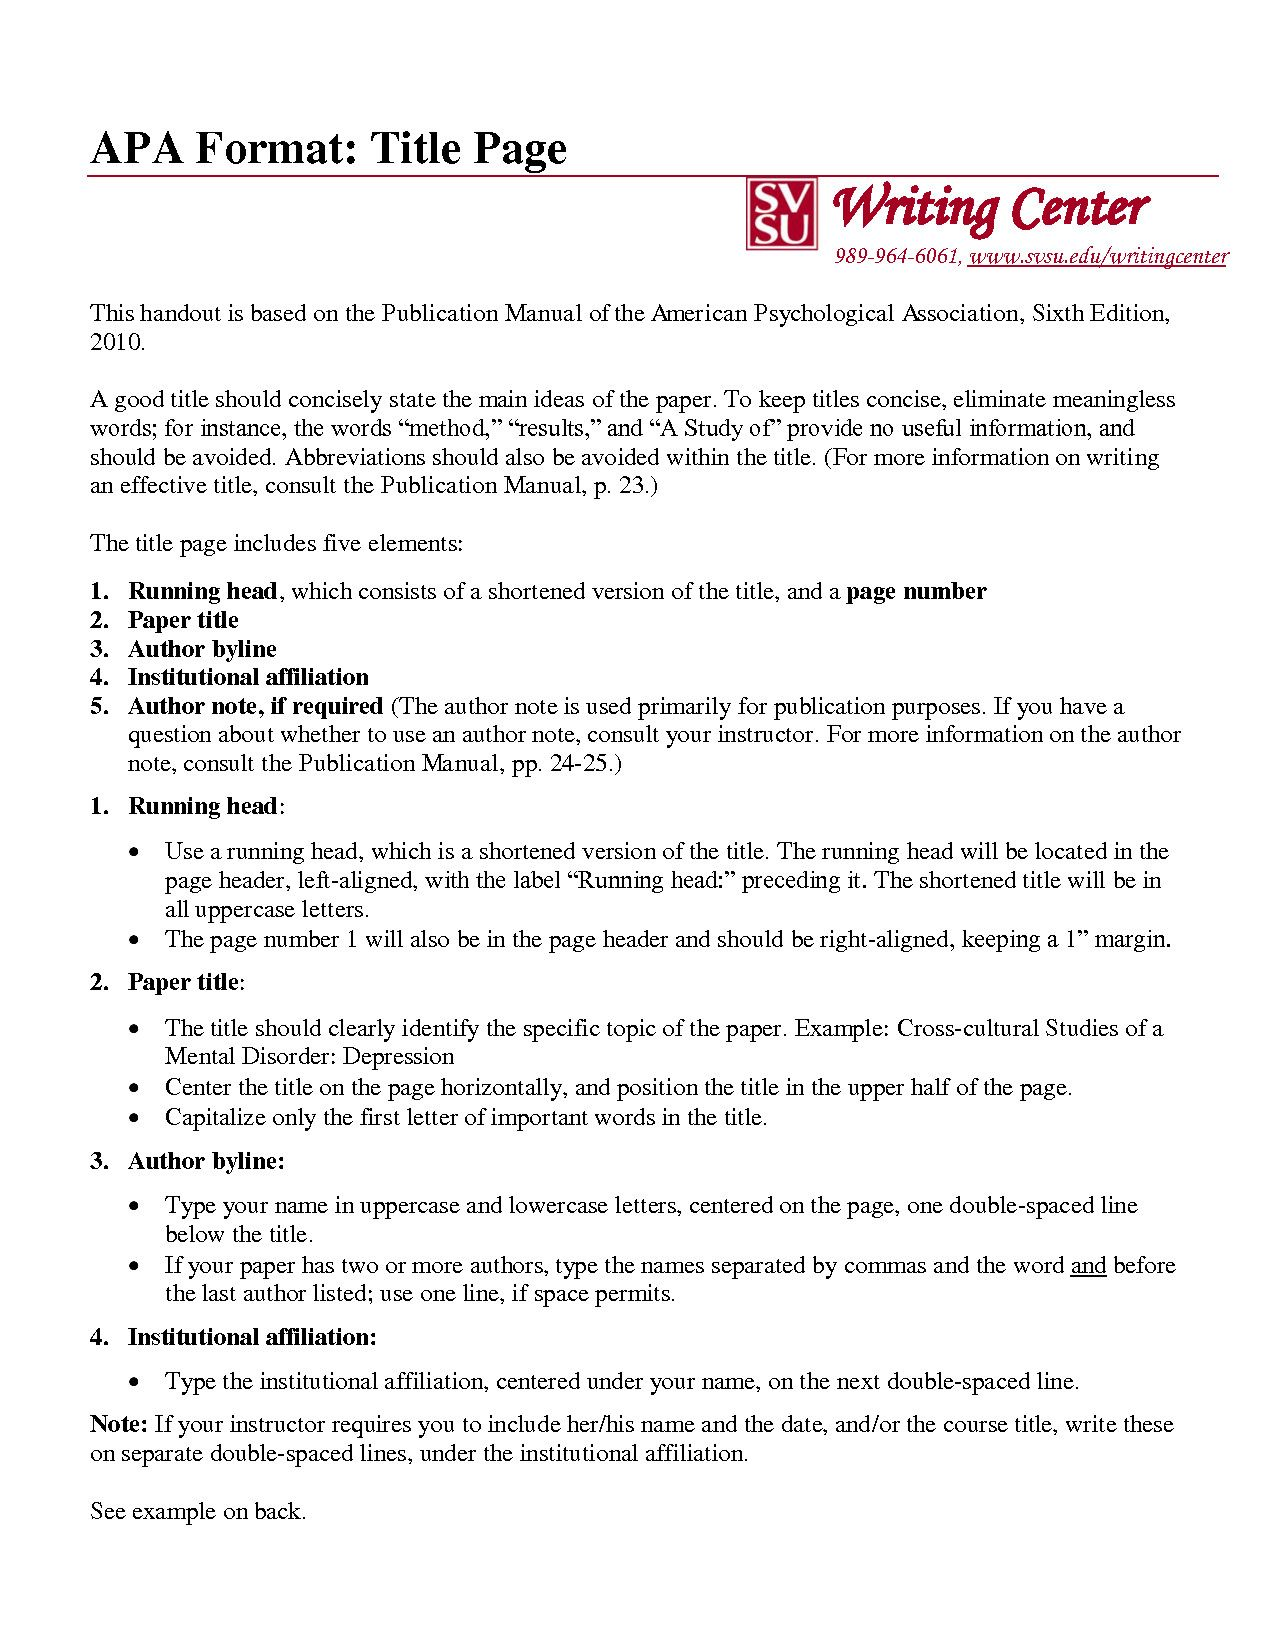 Apa Format Paper Template The Best Apa Paper Template Of 38 Luxury Apa Format Paper Template Research Paper Essay Format Essay